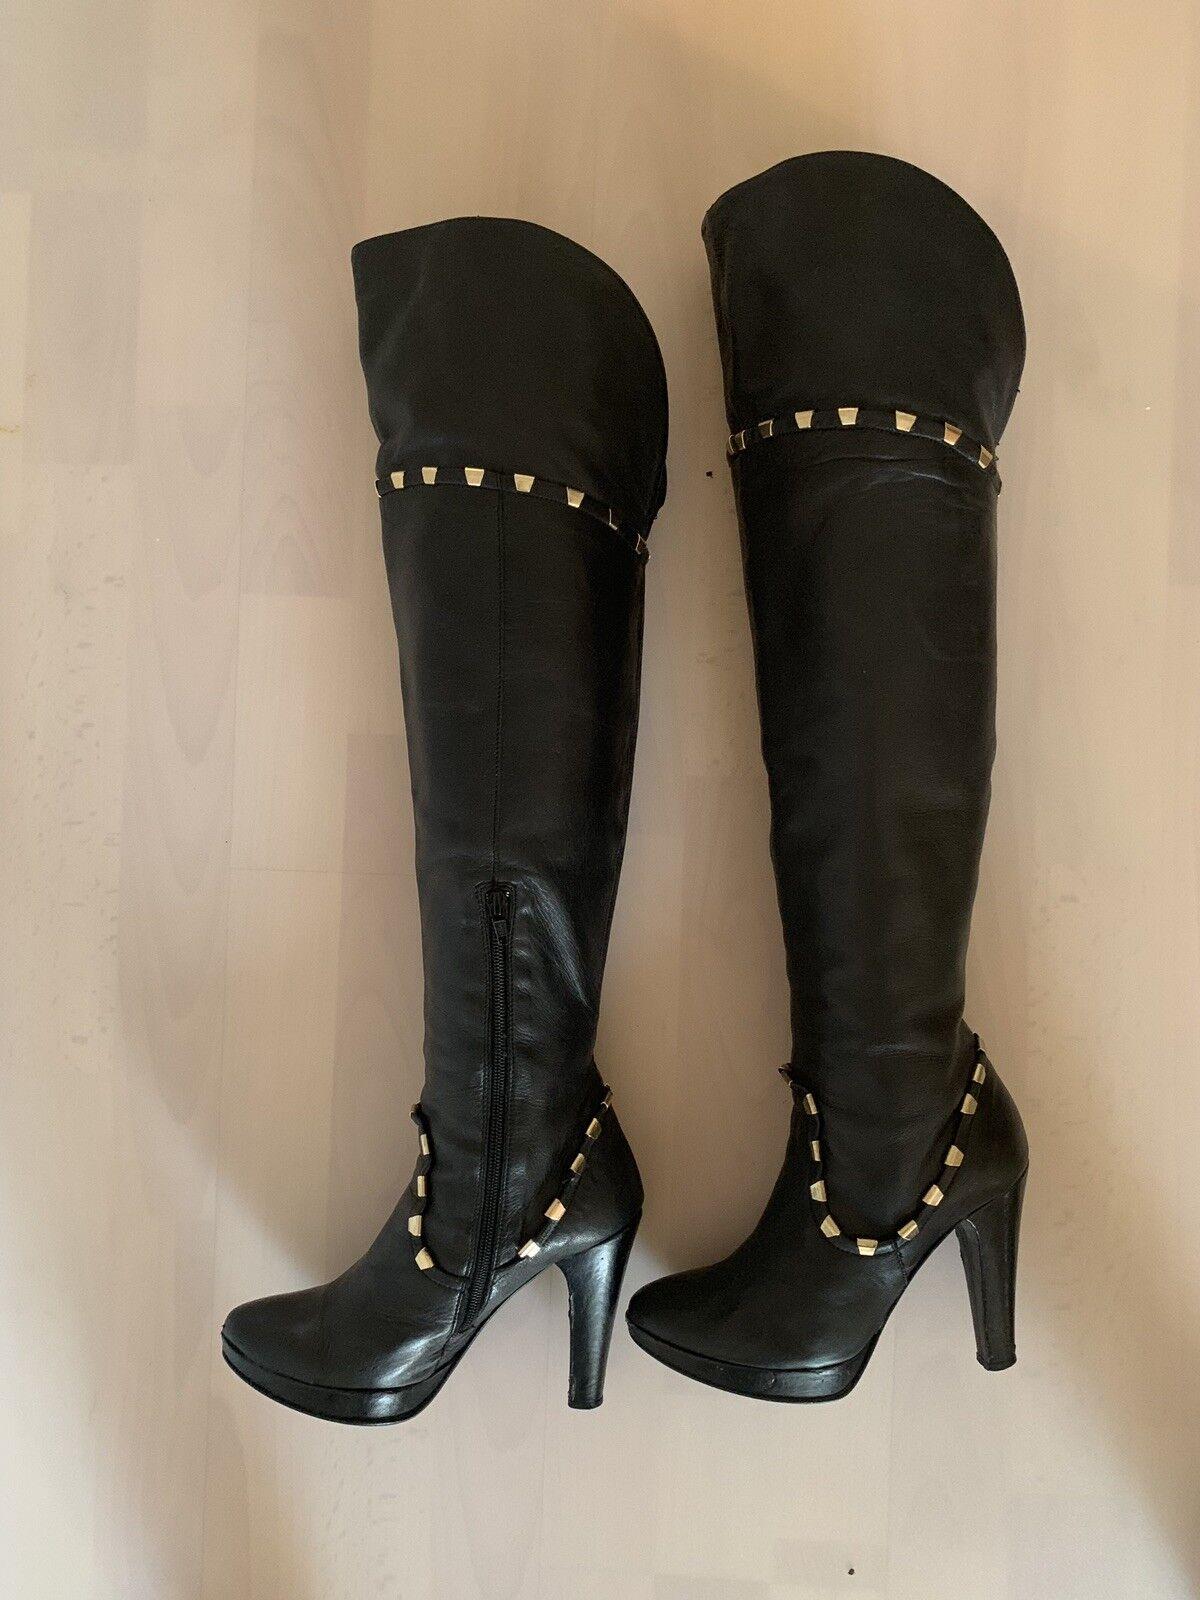 Overknee bottes véritable cuir 38 cuir bottes en cuir Jambières noir or rivets